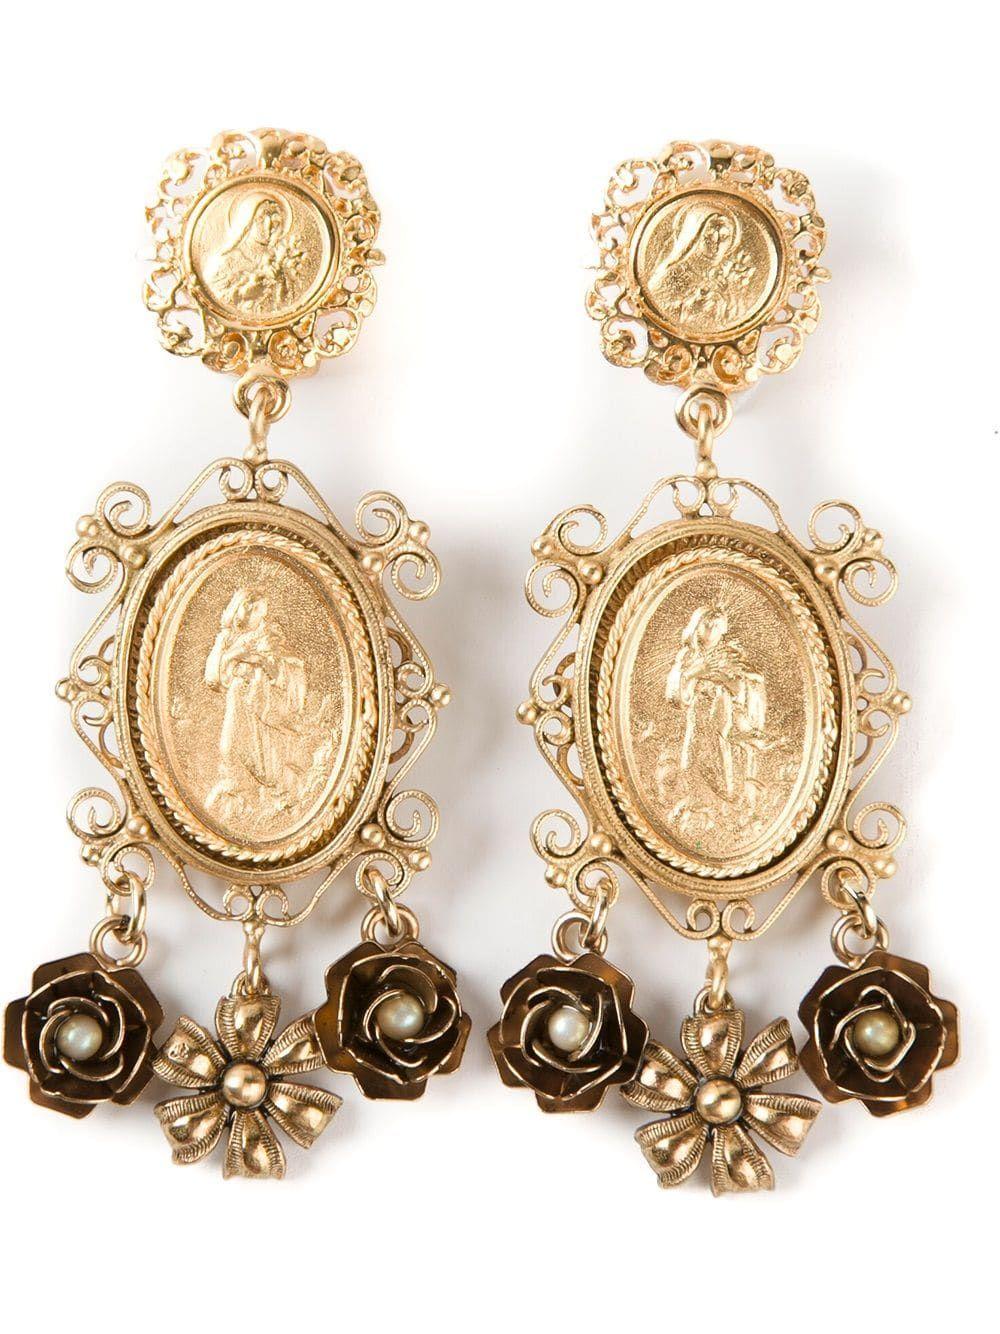 30++ Dolce and gabbana fine jewelry information